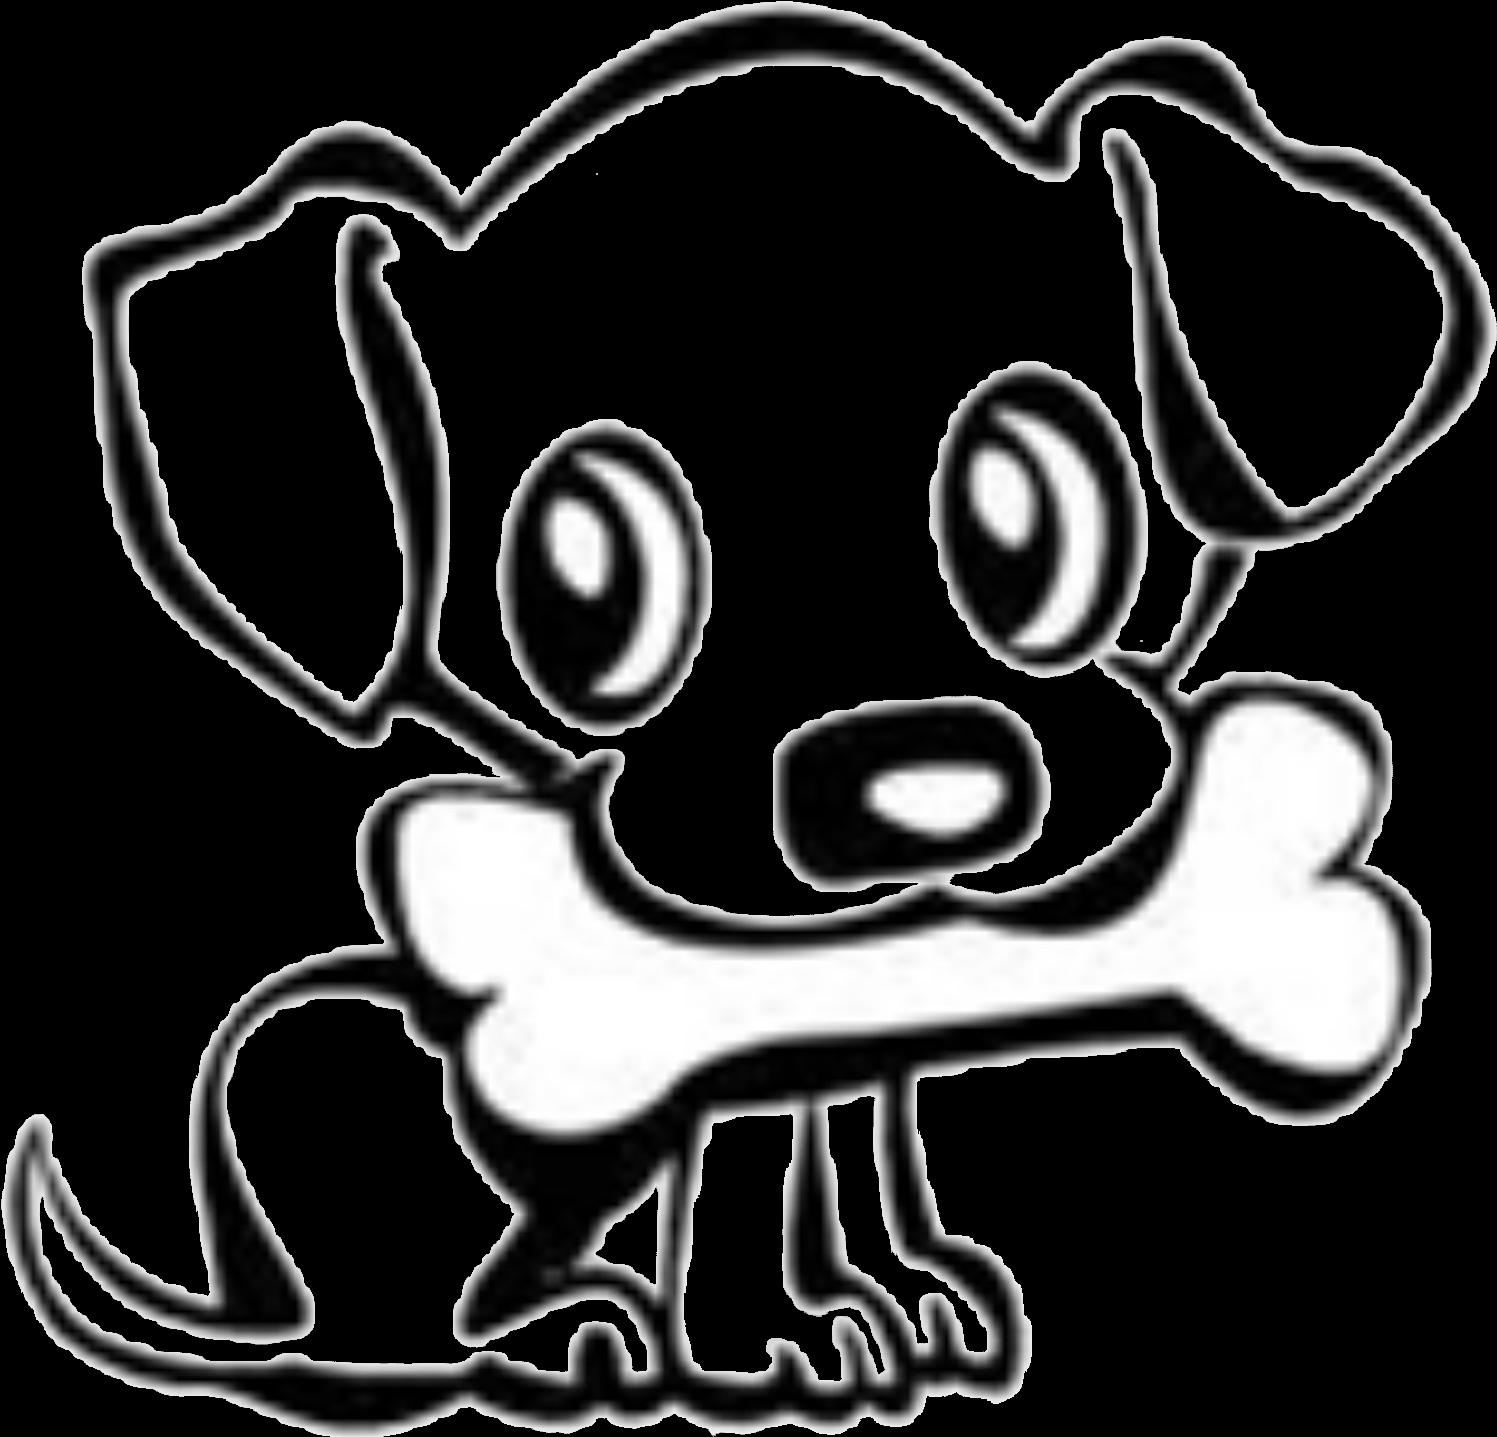 1497x1437 Dog Bone Drawings Group Banner Download